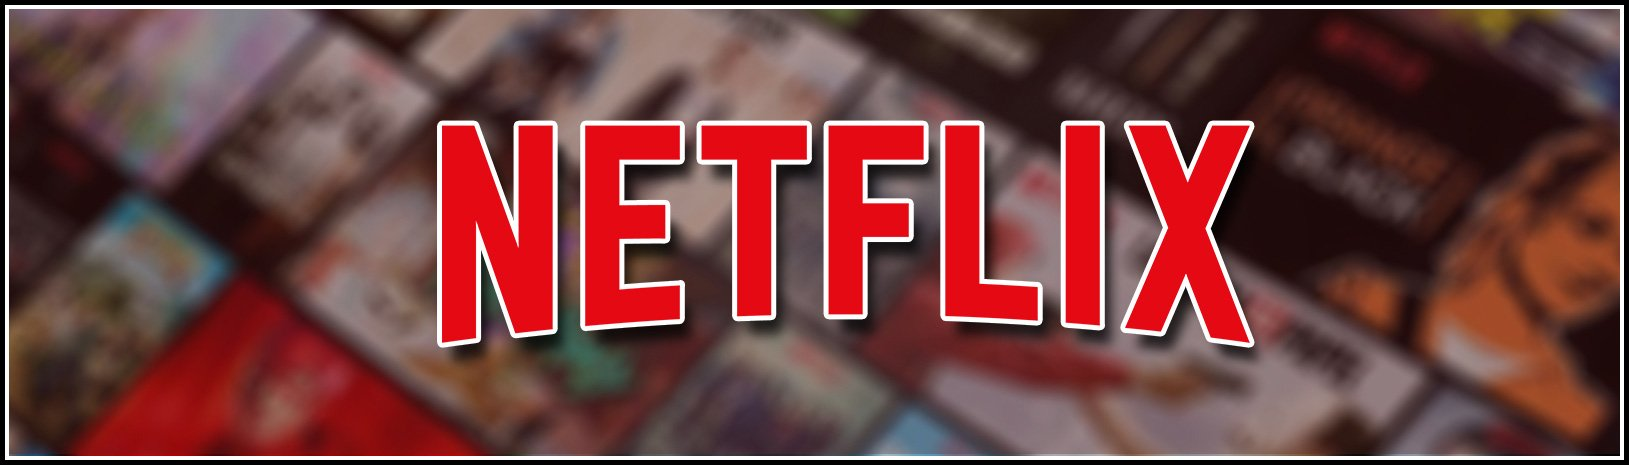 Netflix Collectiom